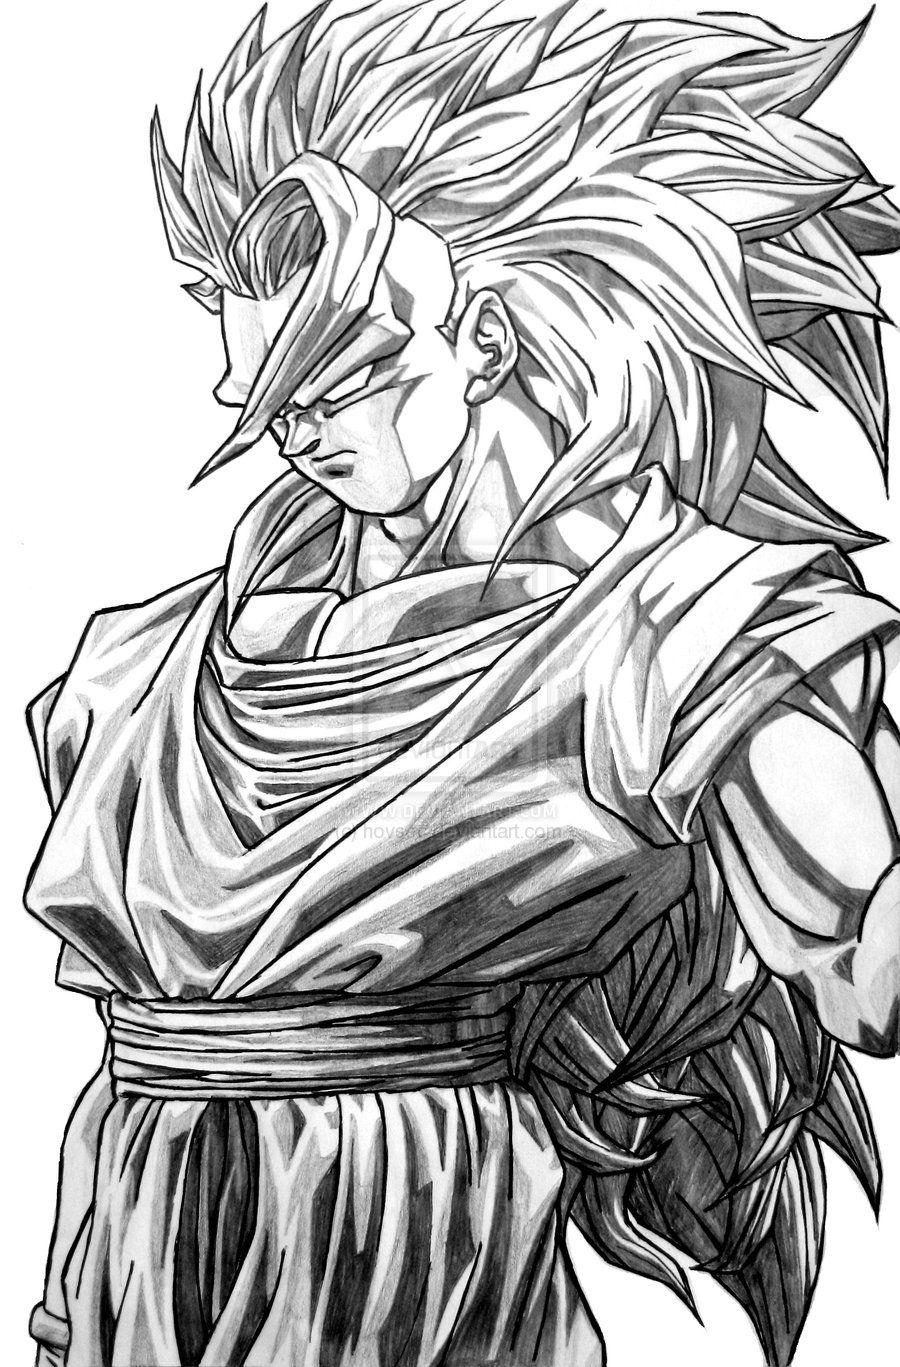 Goku Super Saiyan 3 By Ticodrawing On Deviantart Dragon Ball